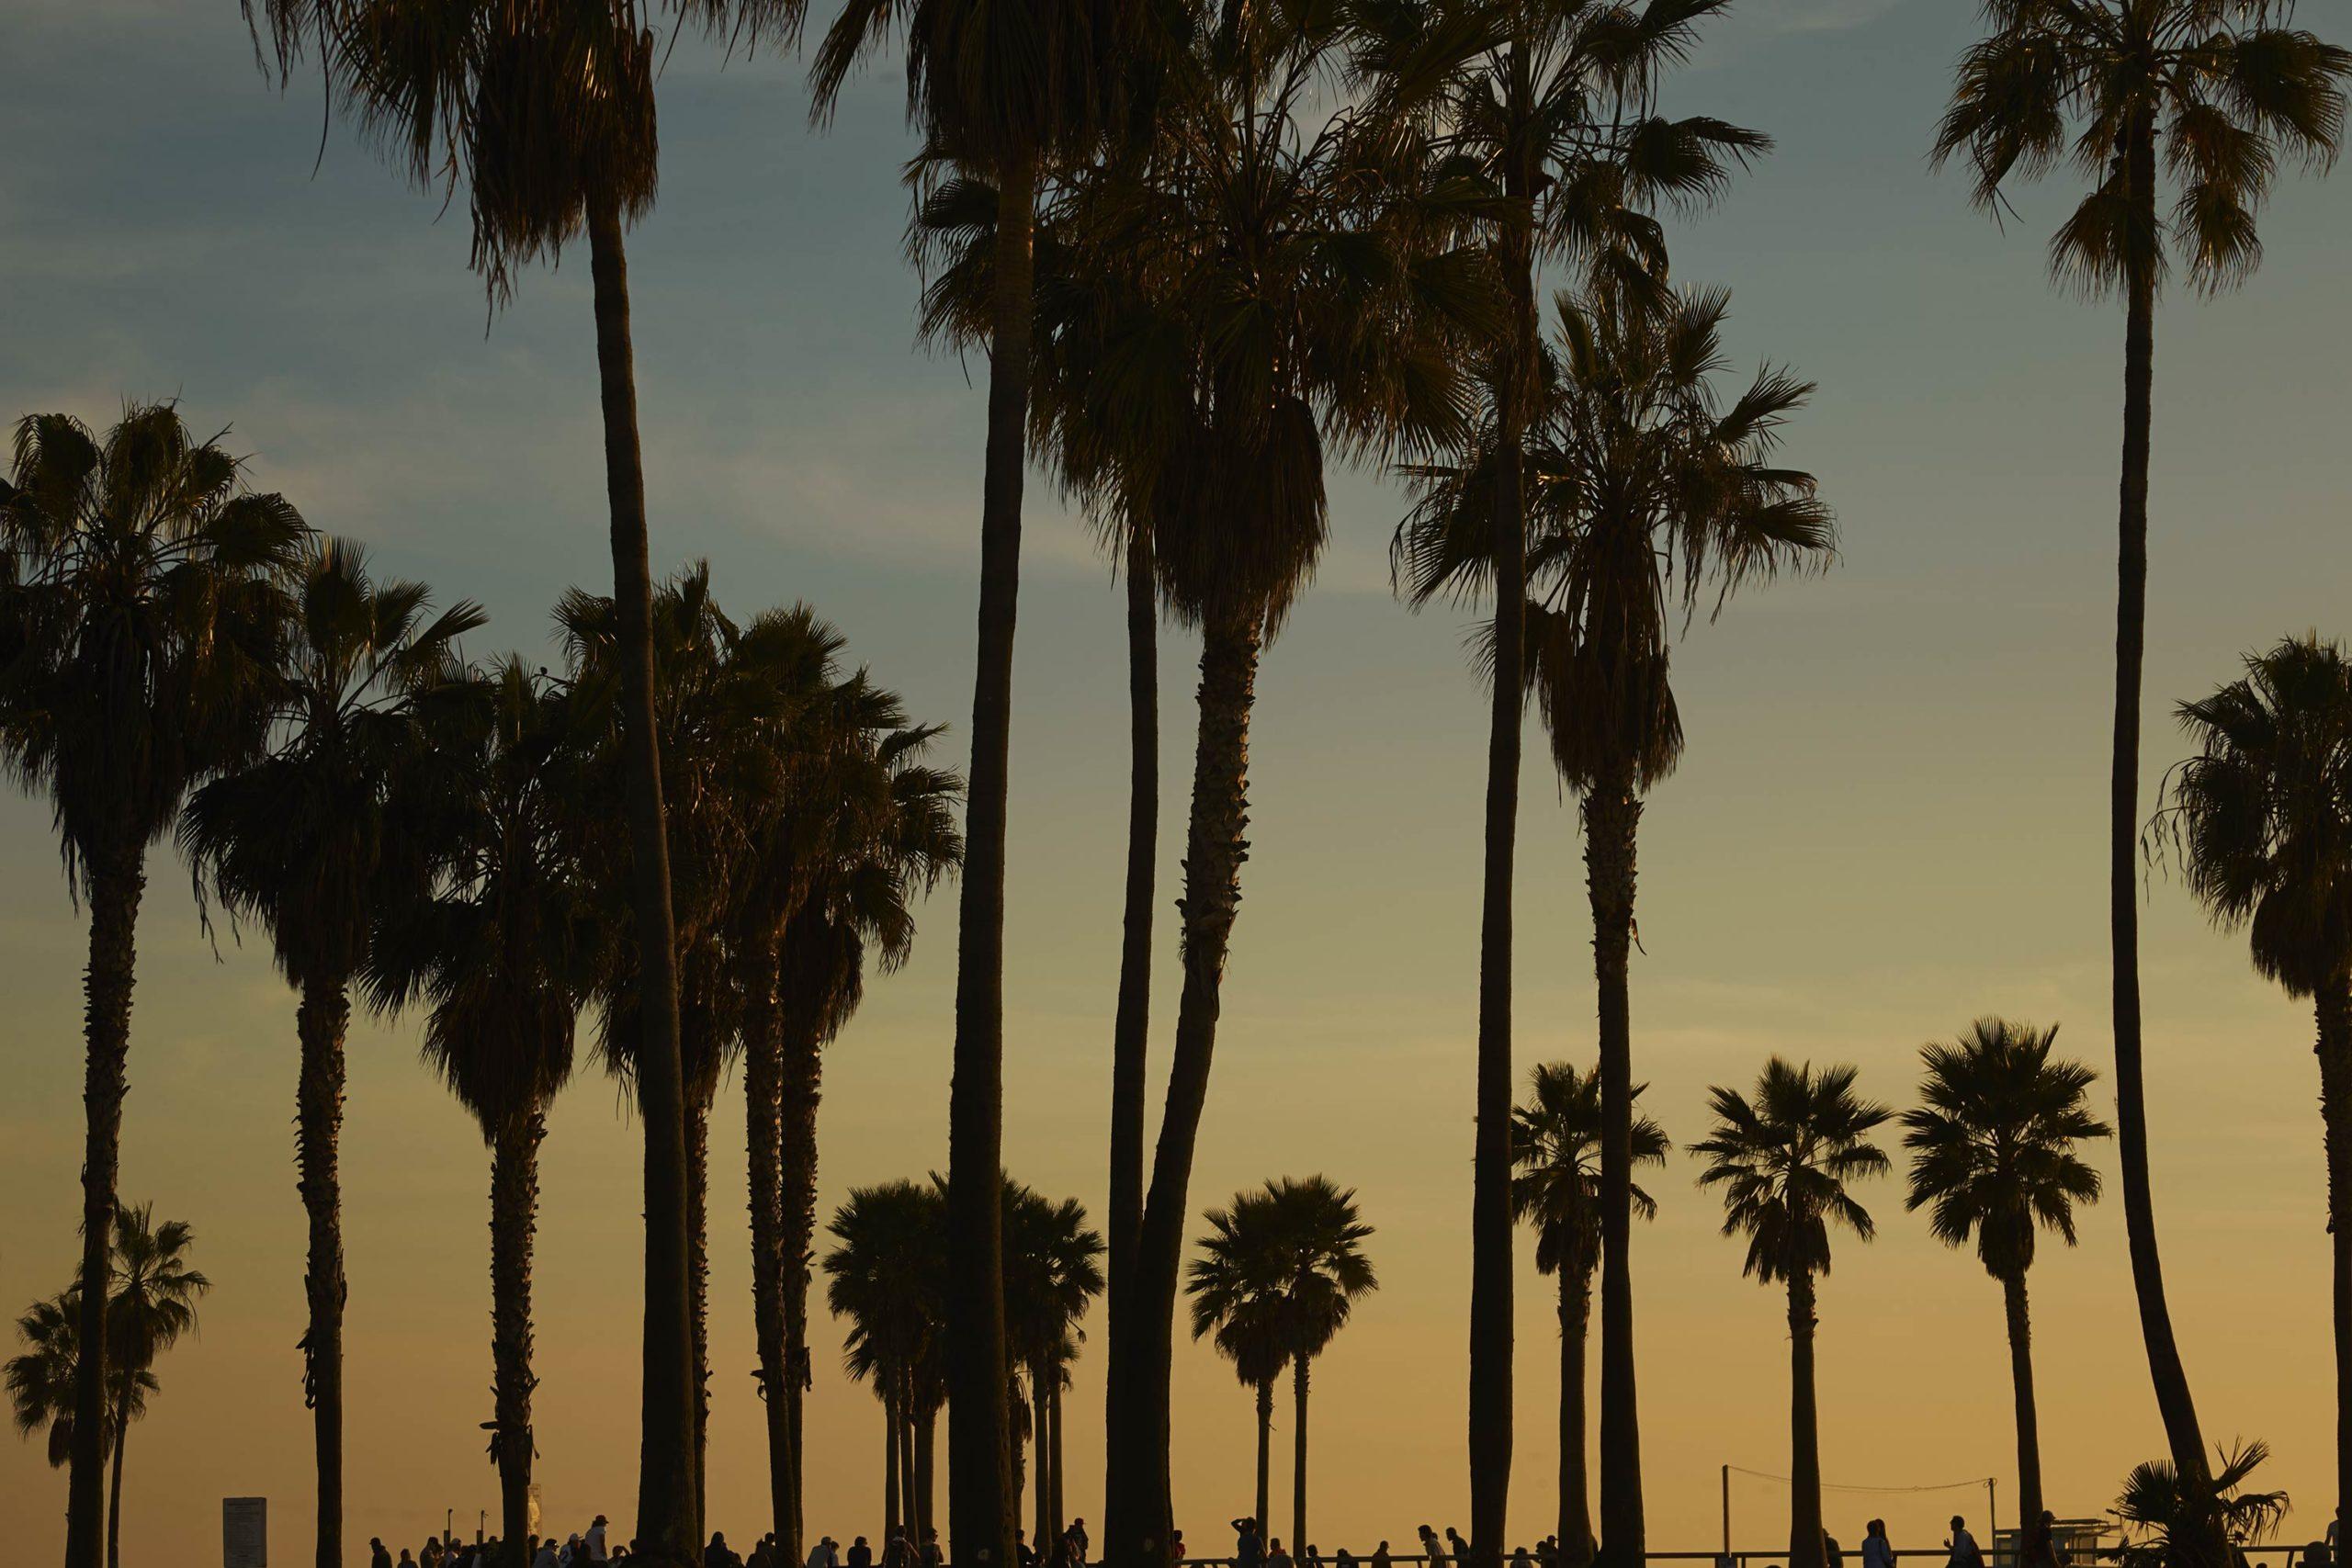 Palms - Skate Park, Venice Beach Collection - Fine Art Photography by Toby Dixon